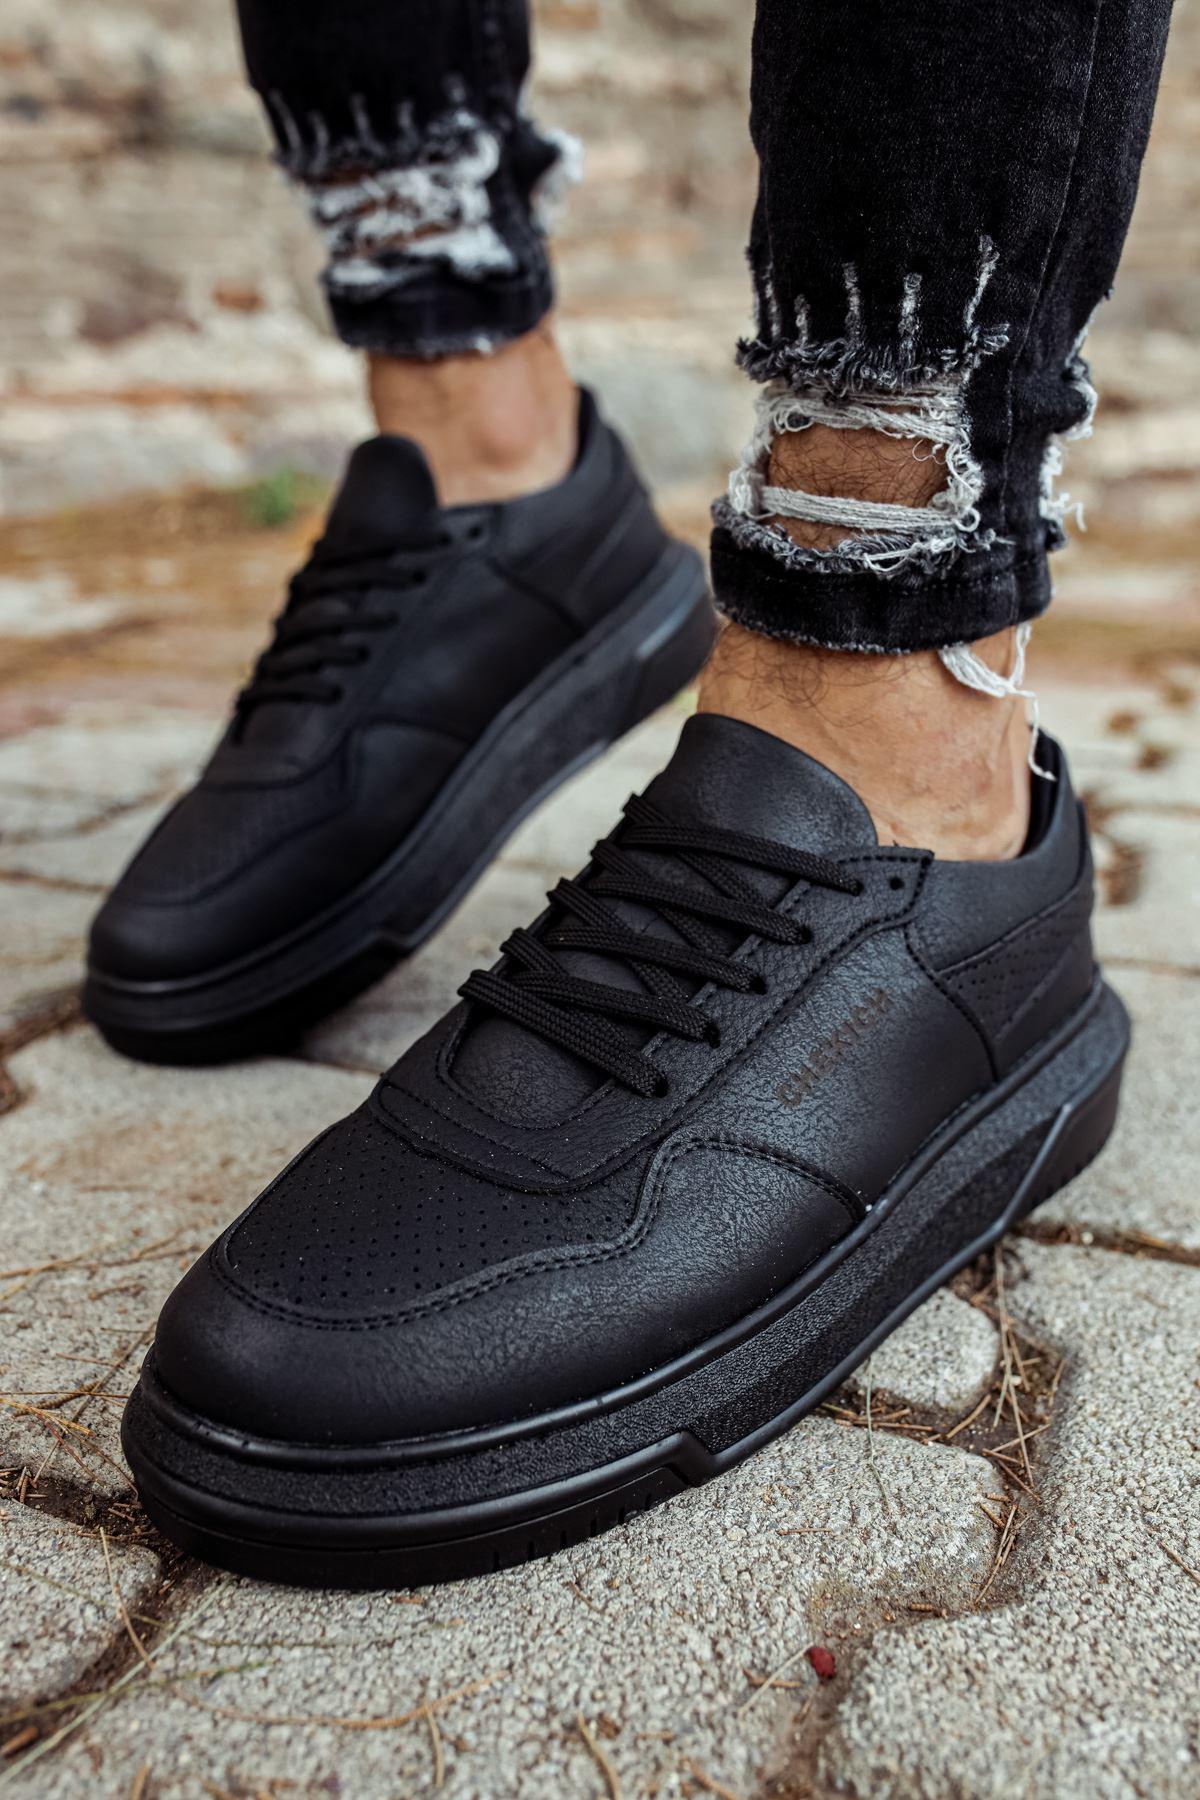 Chekich CH075 Siyah Taban Erkek Ayakkabı SIYAH